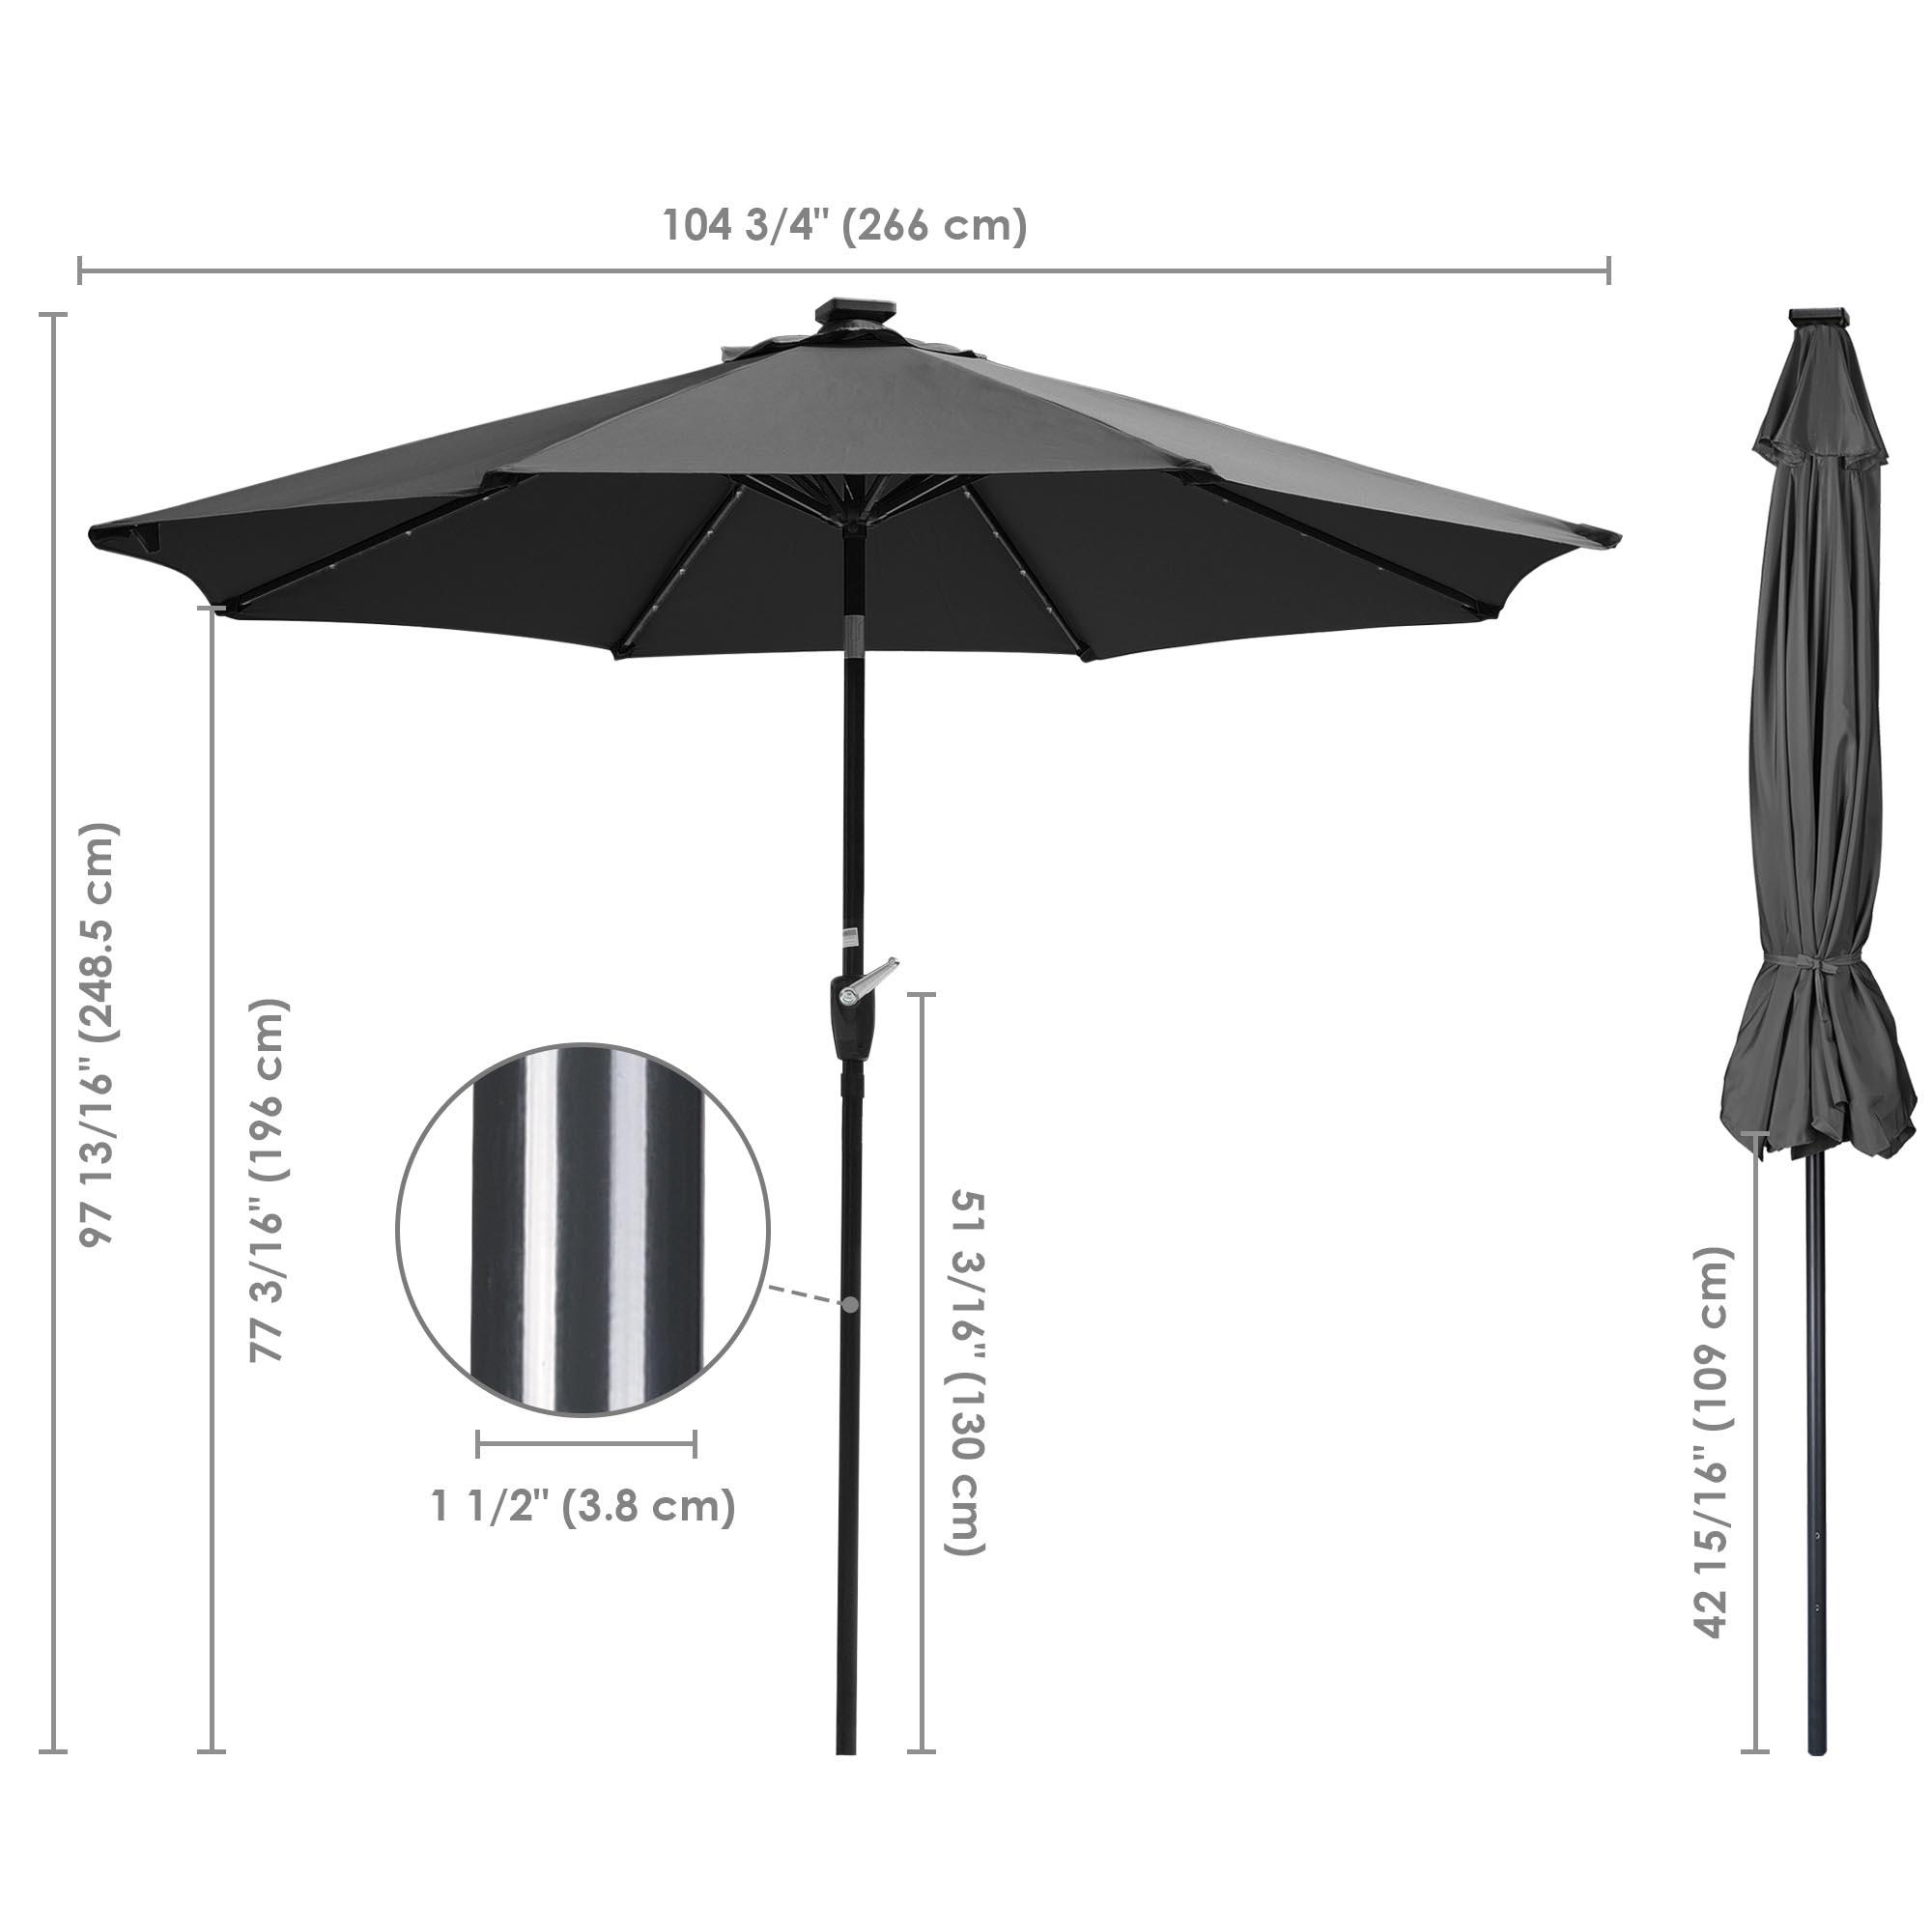 thumbnail 40 - 9' Patio Outdoor Umbrella Solar LED 8 Rib Garden Parasol Yard Deck Table Shade